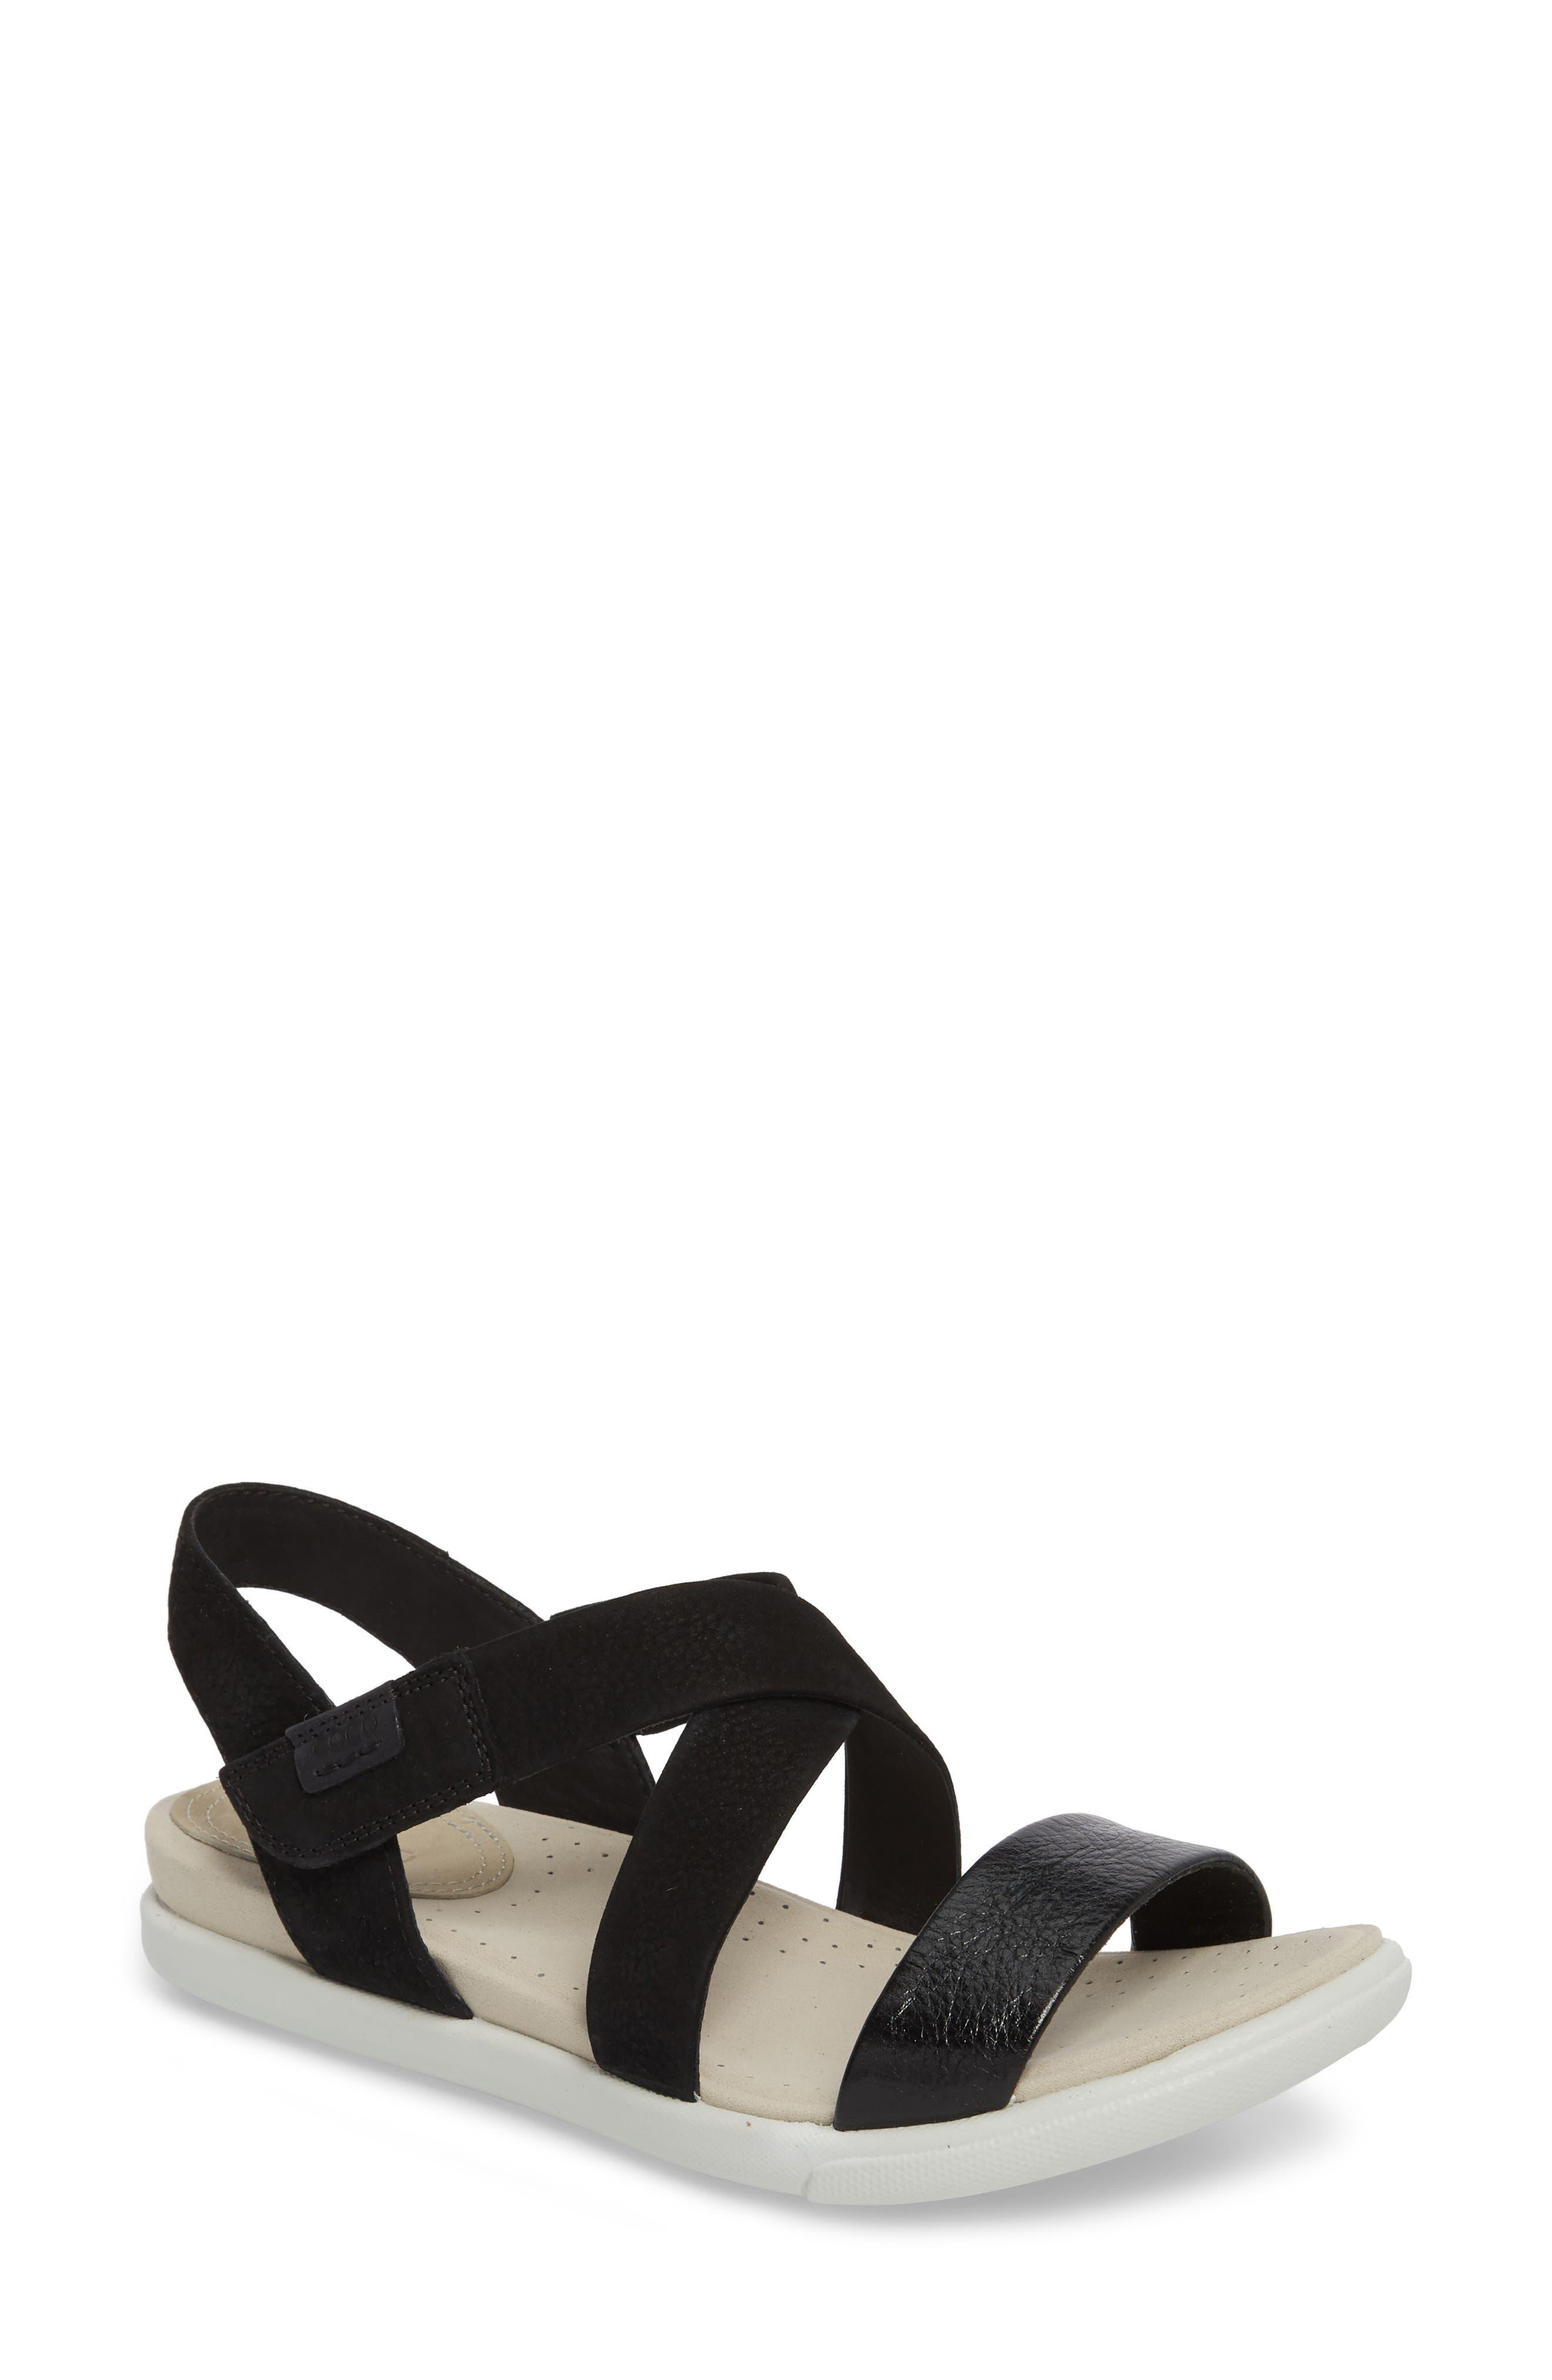 Damara Cross-Strap Sandal,                             Main thumbnail 1, color,                             Black Leather